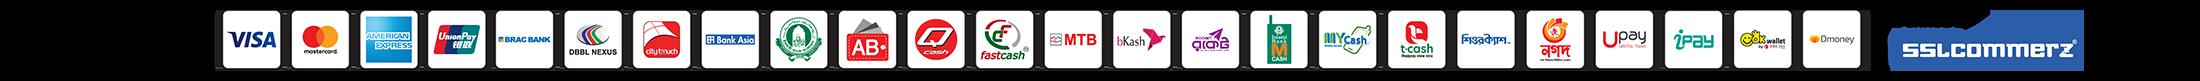 bdwebtech payment option bkash rocket credit card visa mastercard nagad